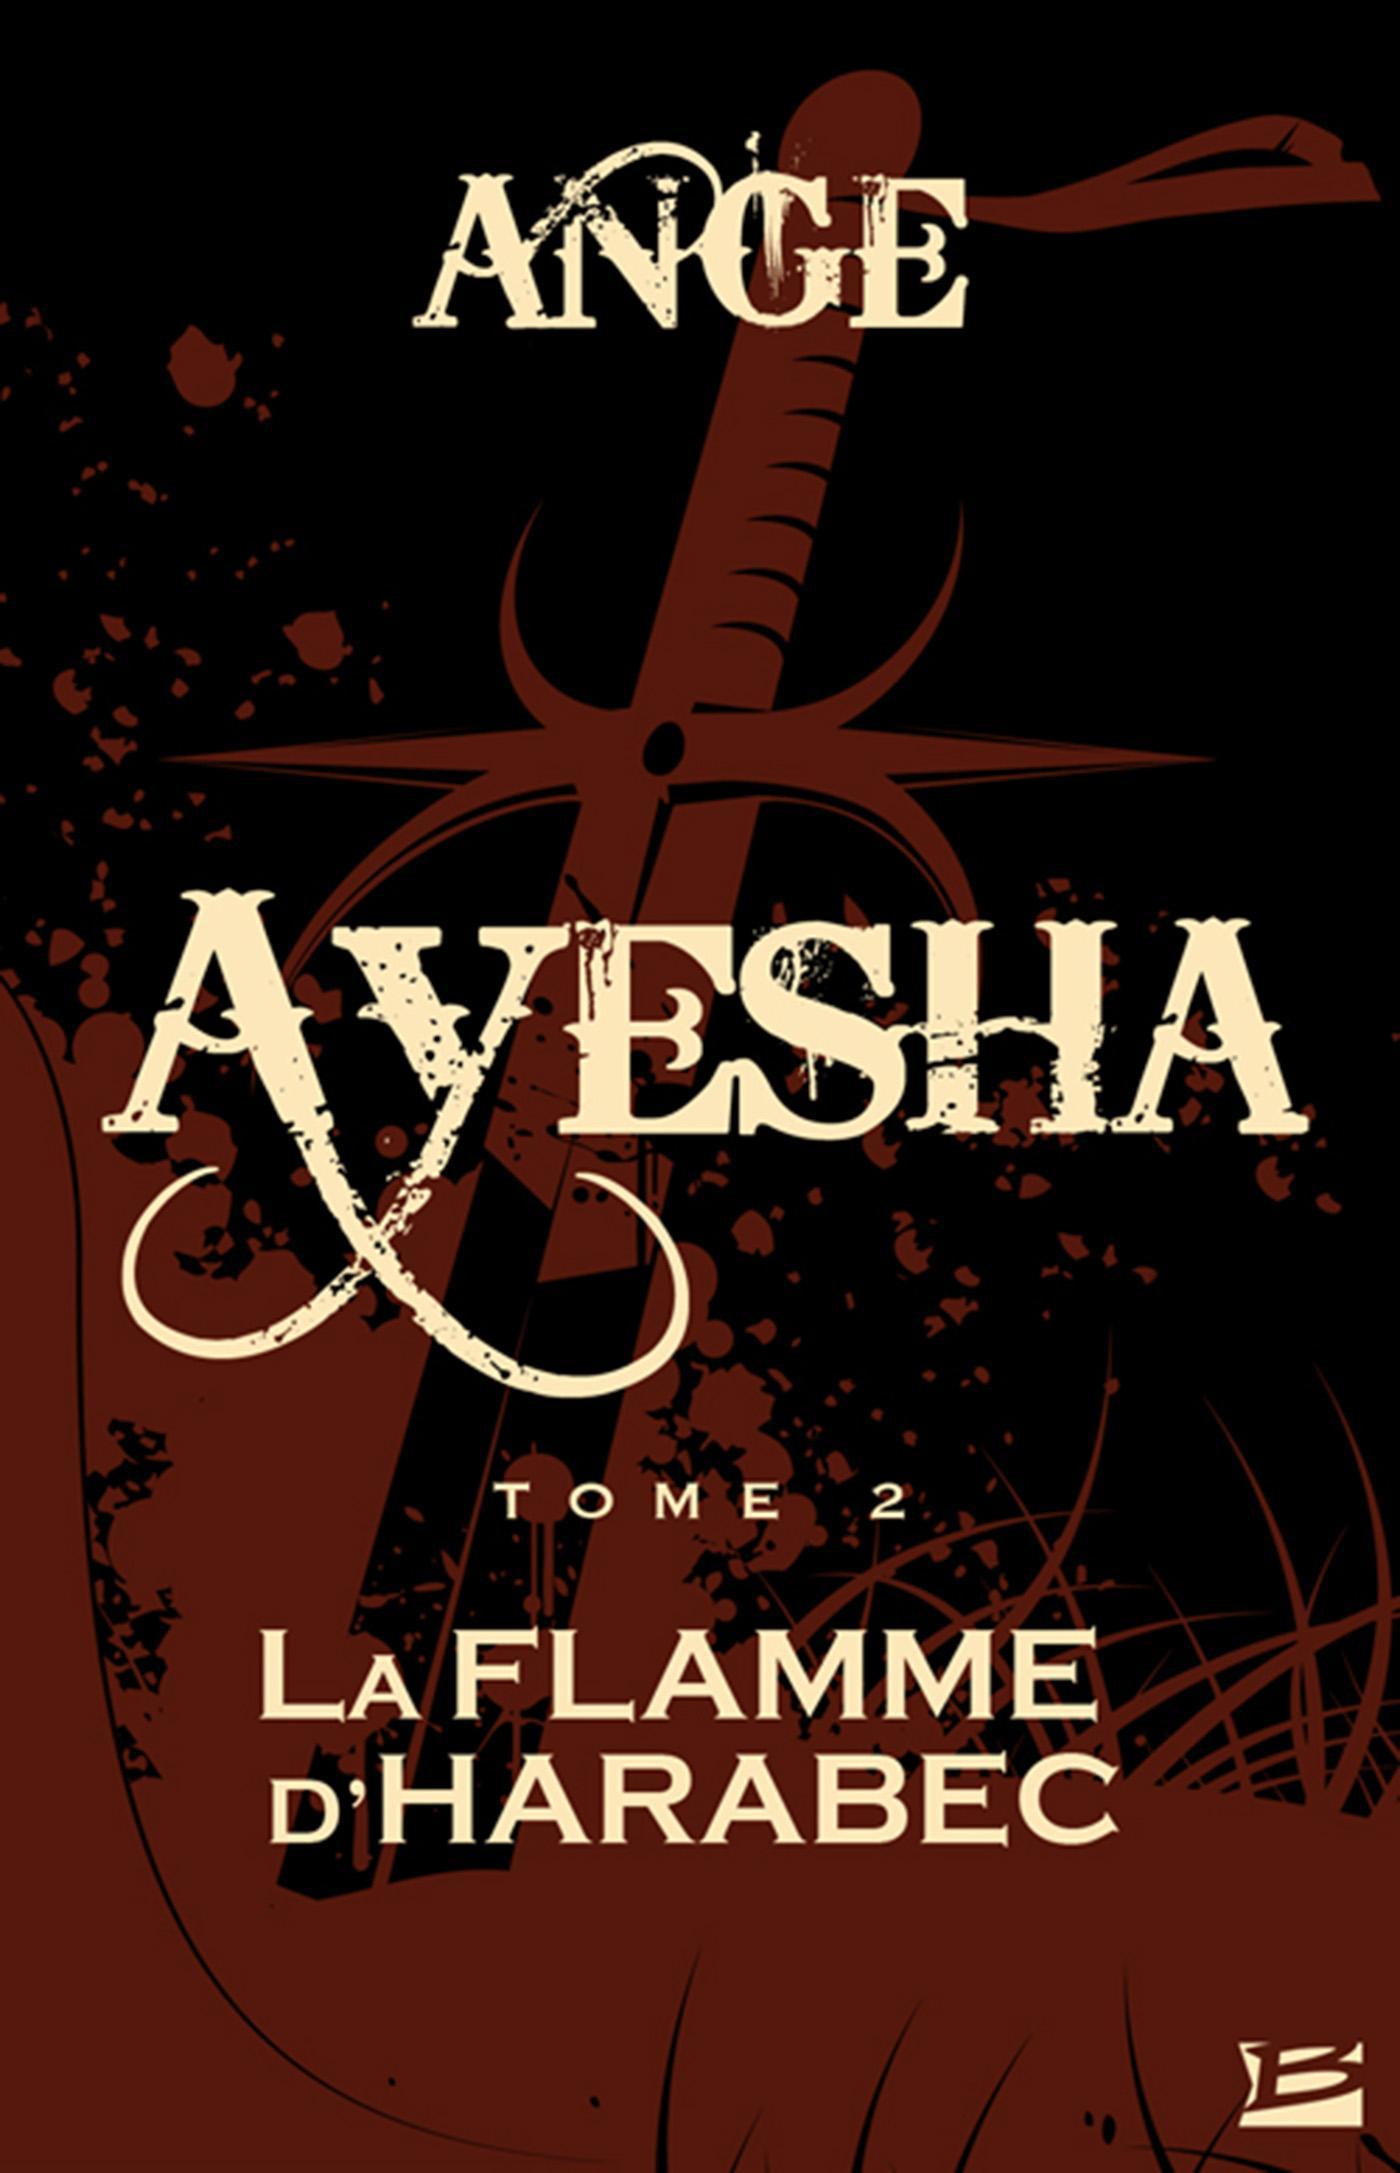 La Flamme d'Harabec, AYESHA, T2